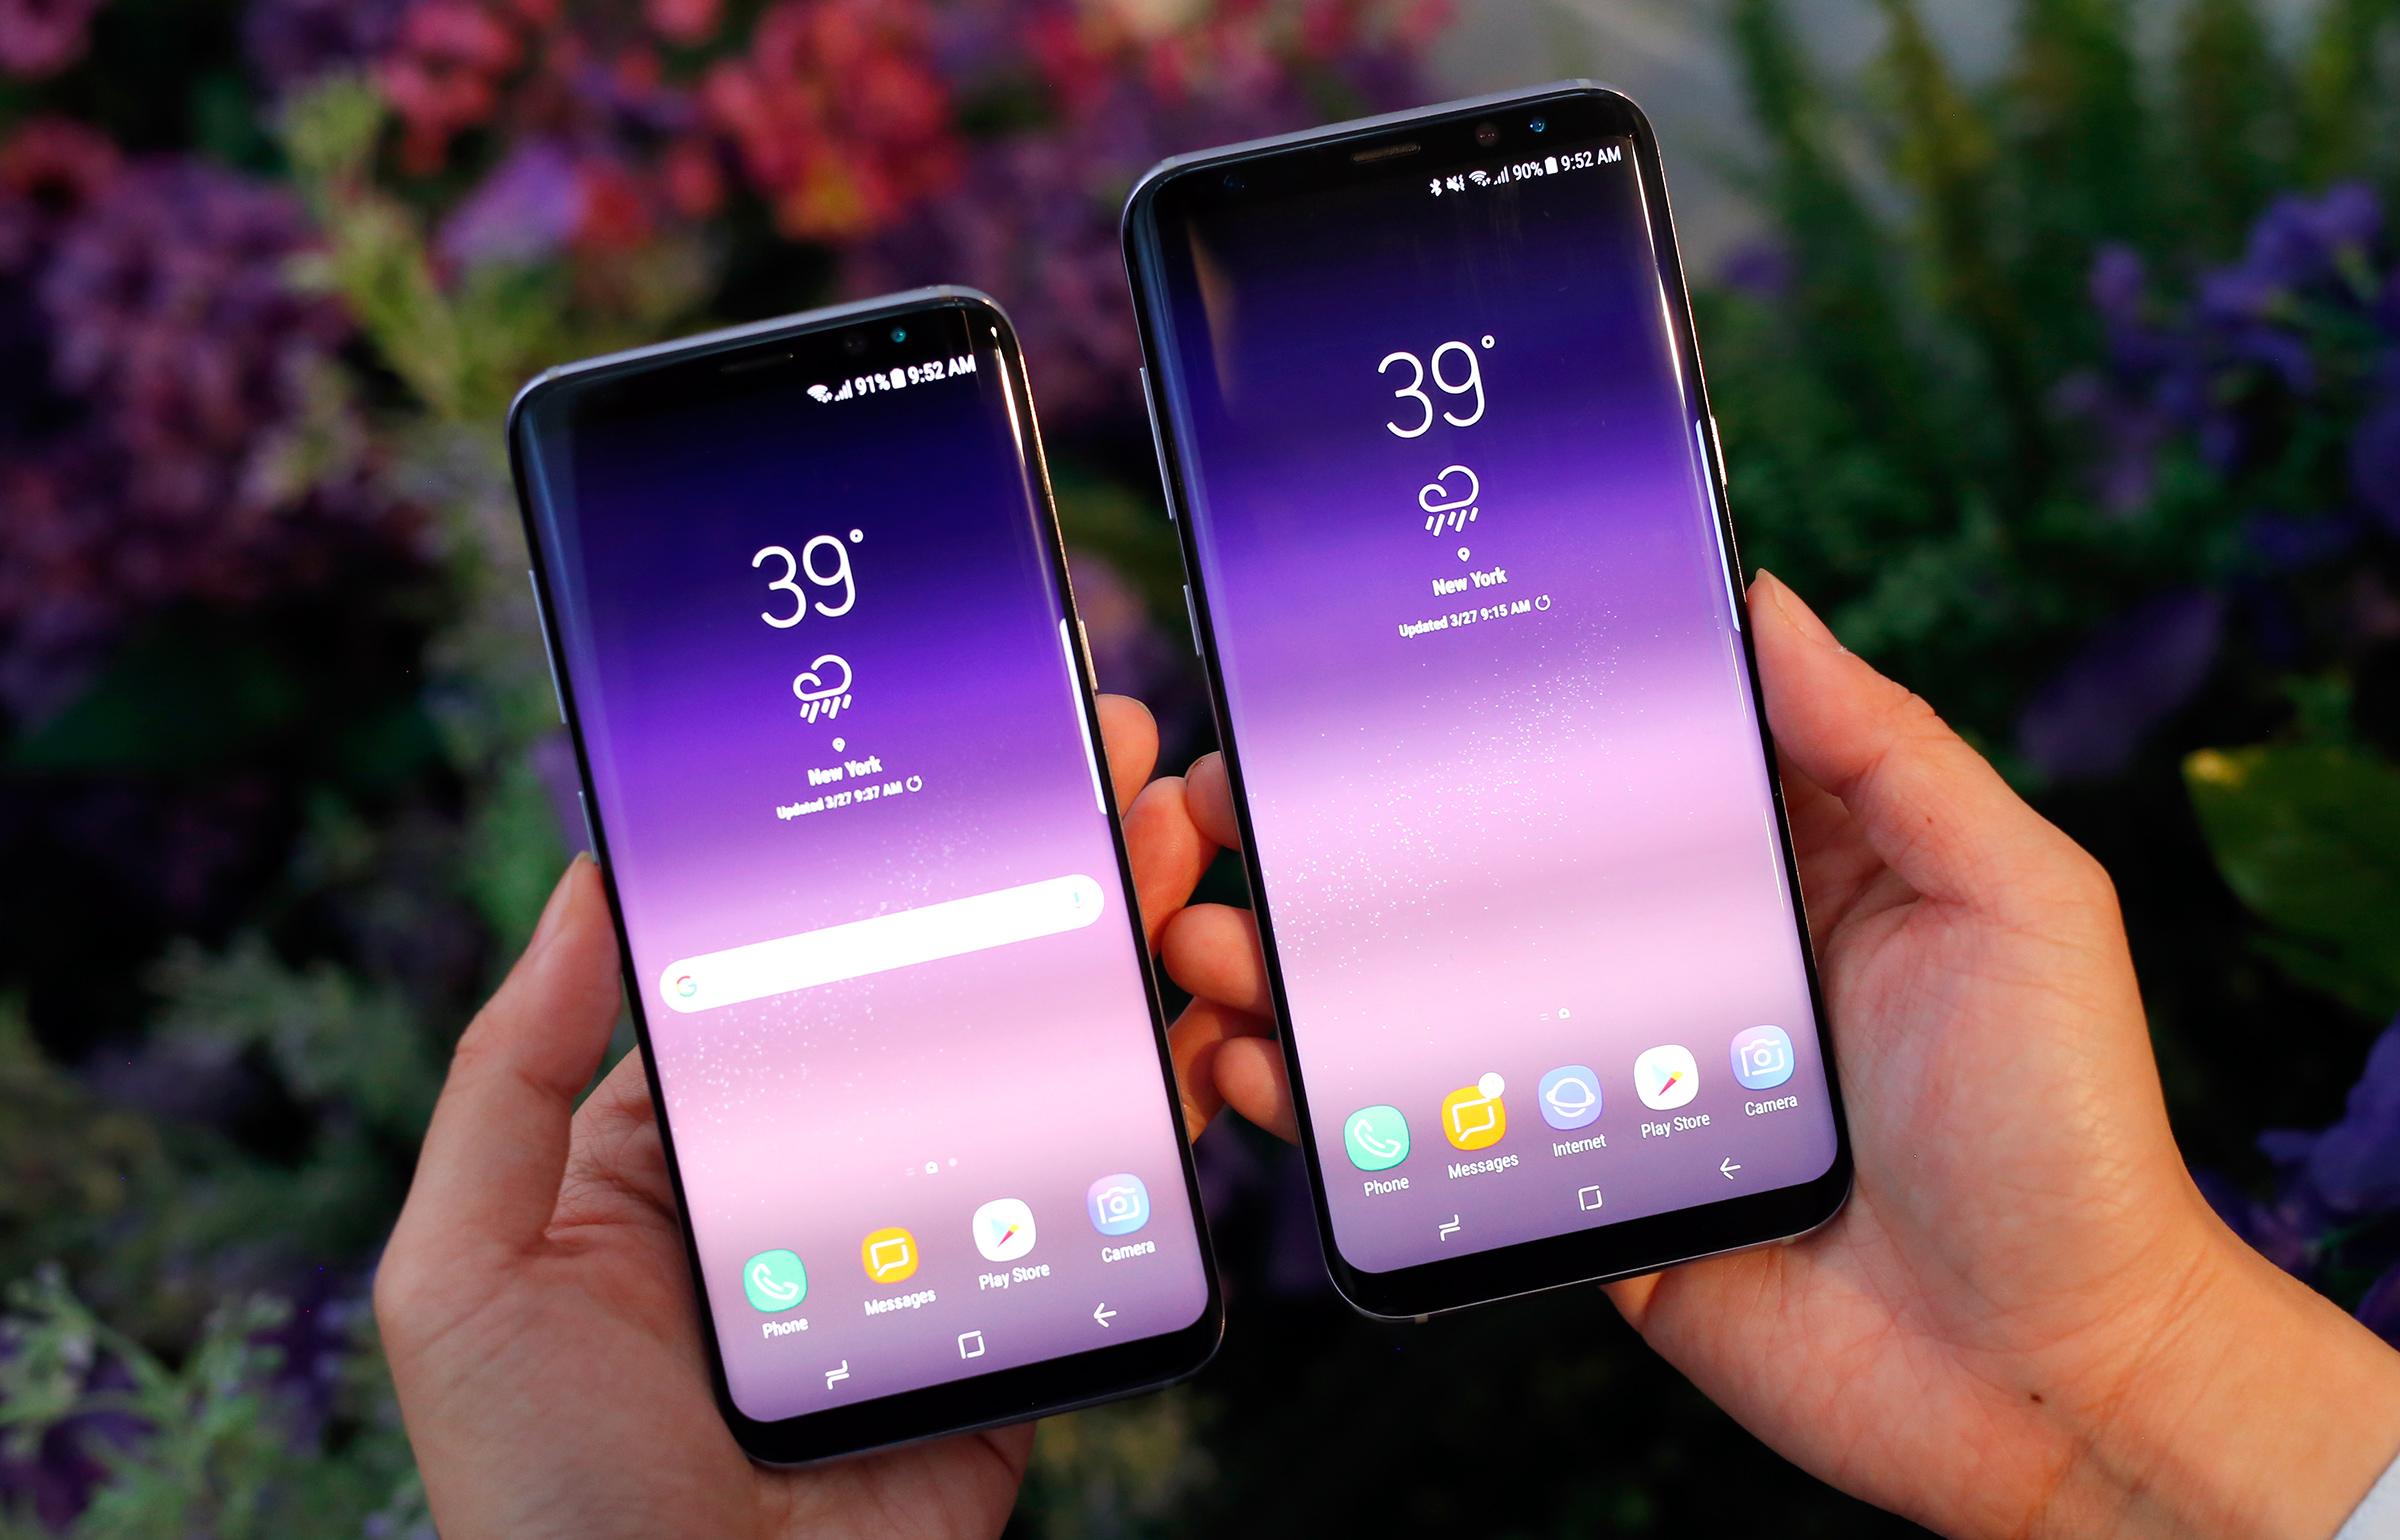 Android: Samsung começa a atualizar os Galaxy S8 e S8+ no Brasil para o Android Oreo